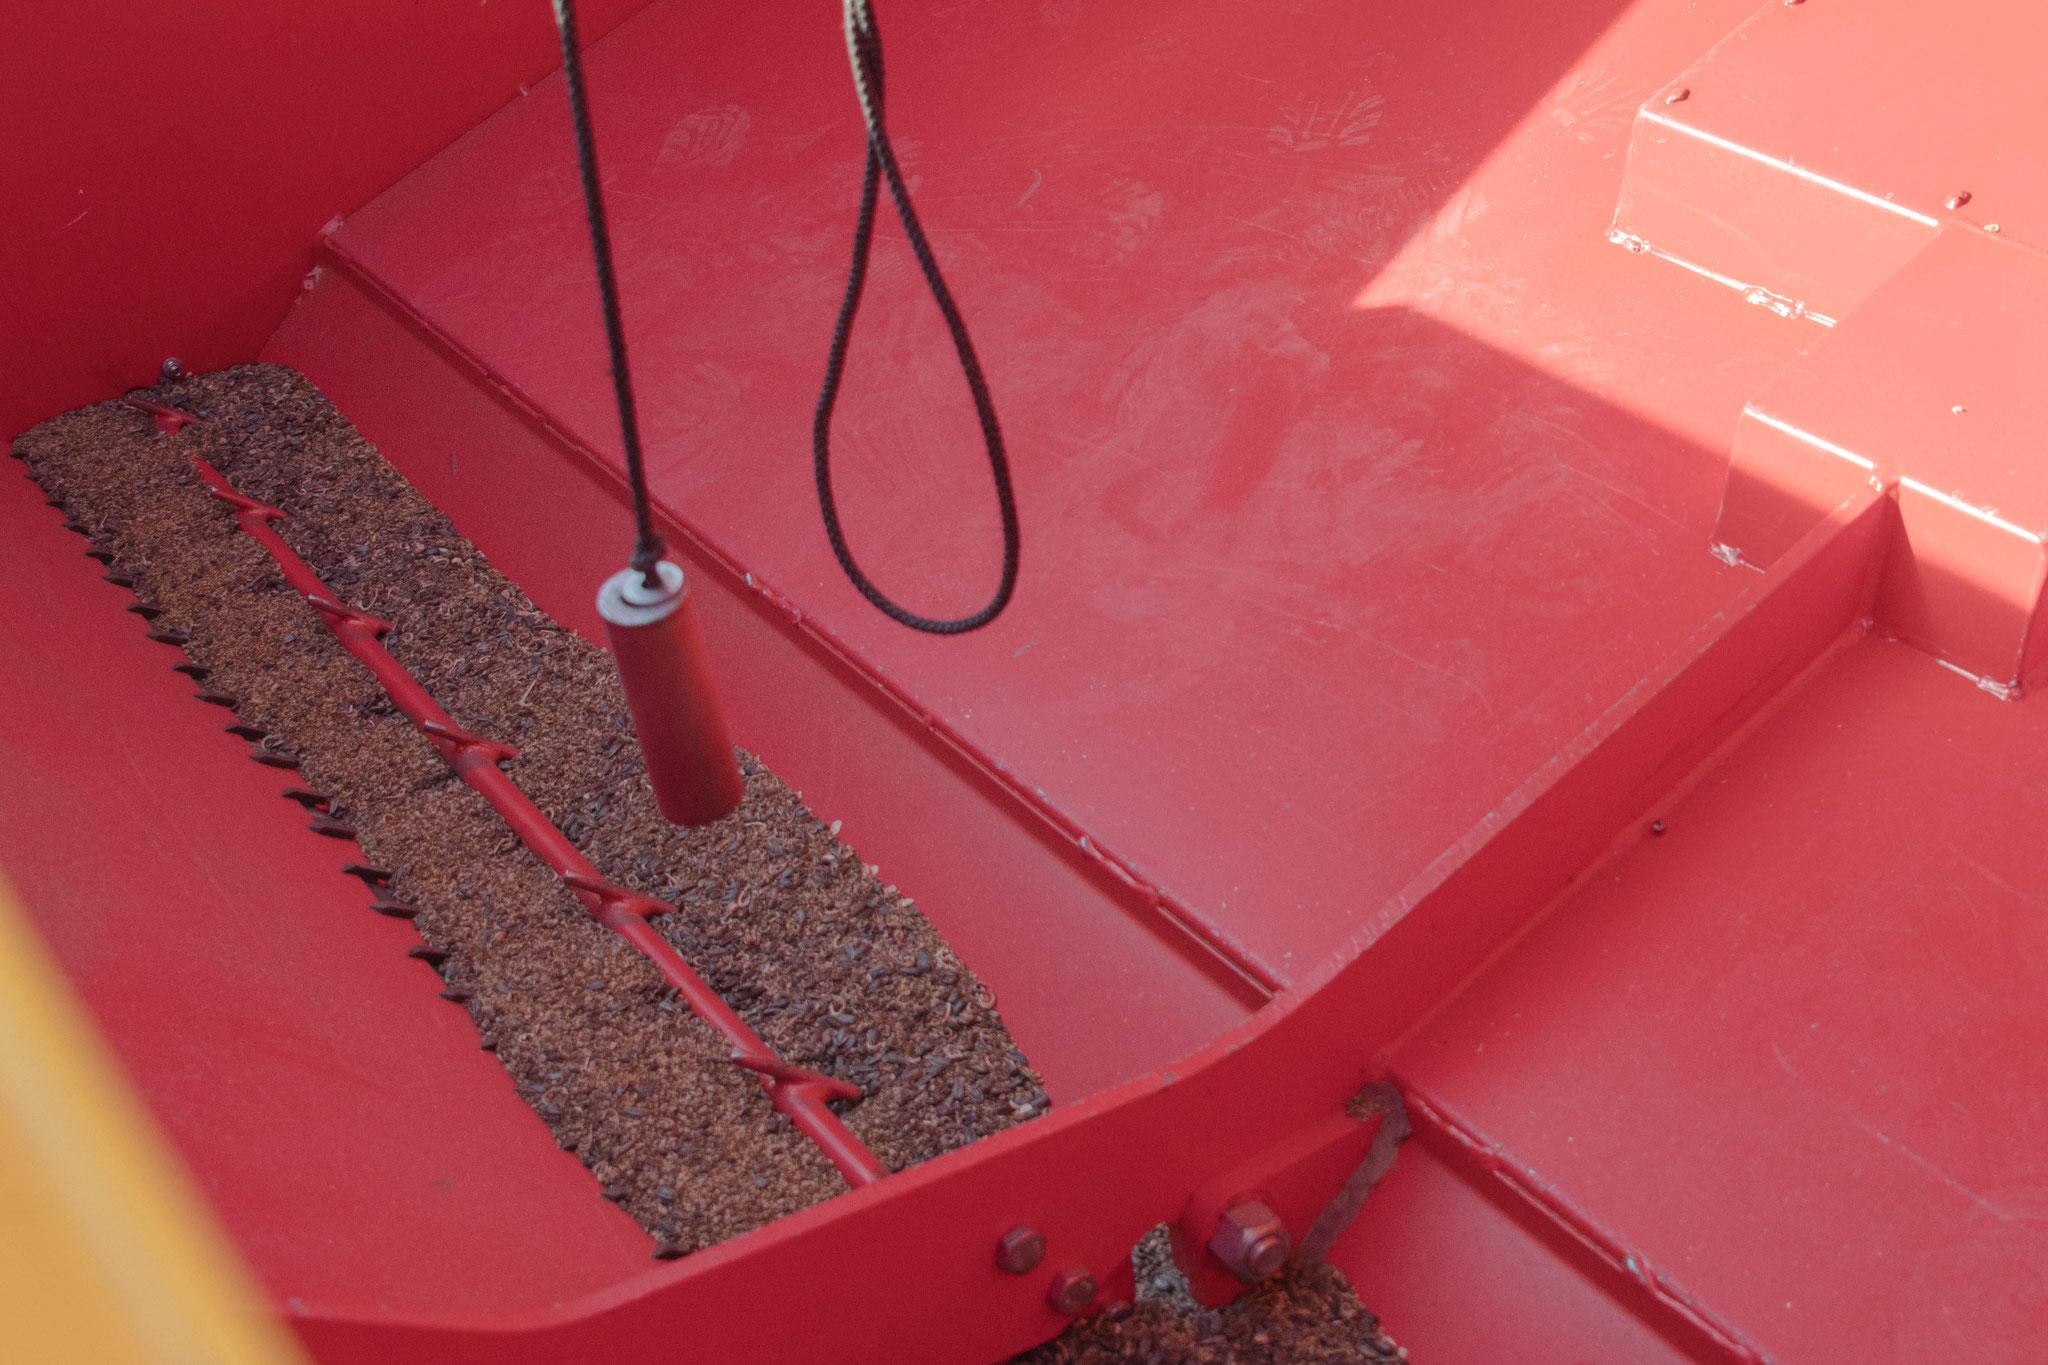 Überprüfung der Saatgutmenge